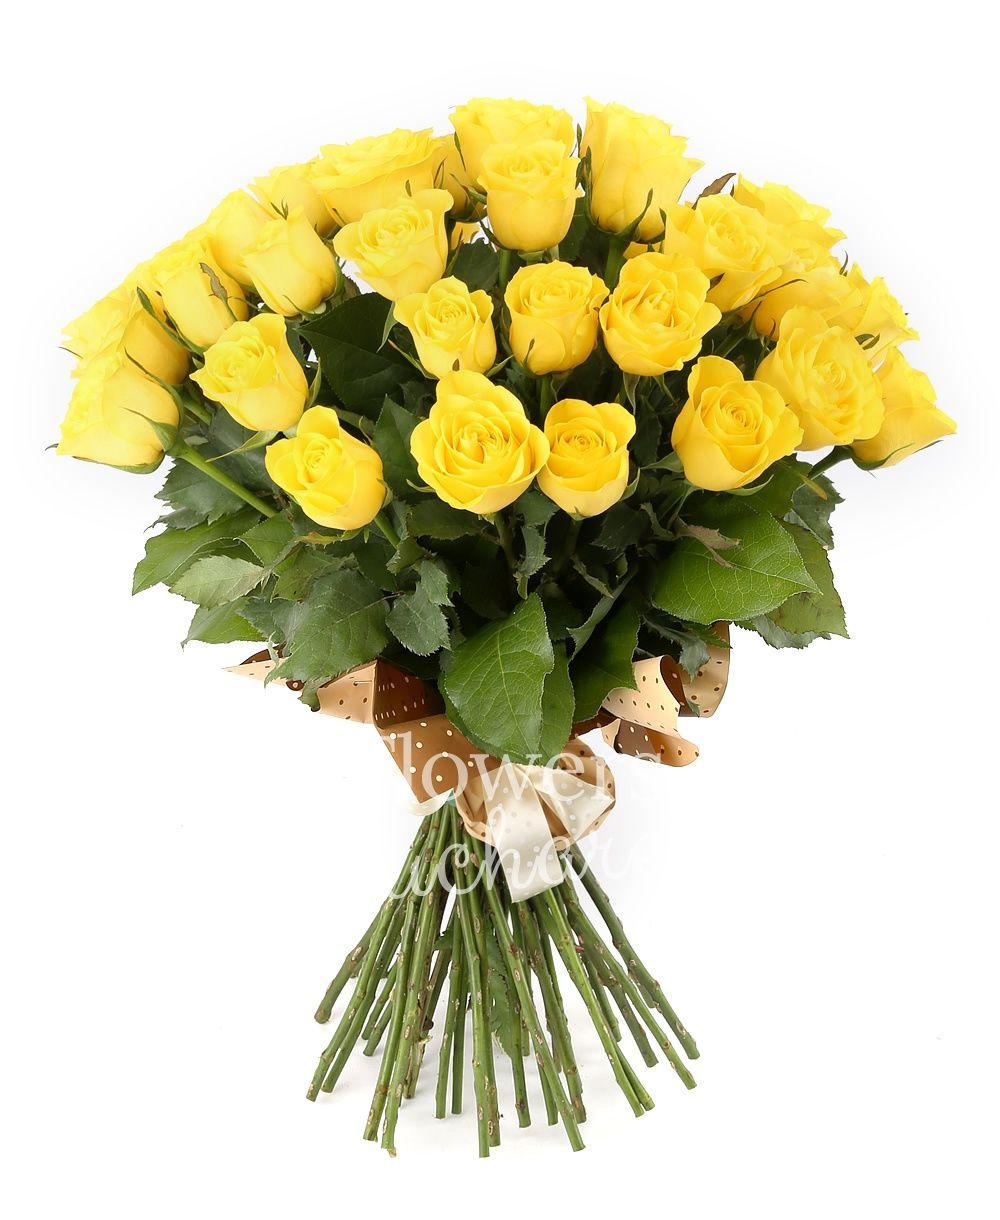 29 yellow roses, greenery